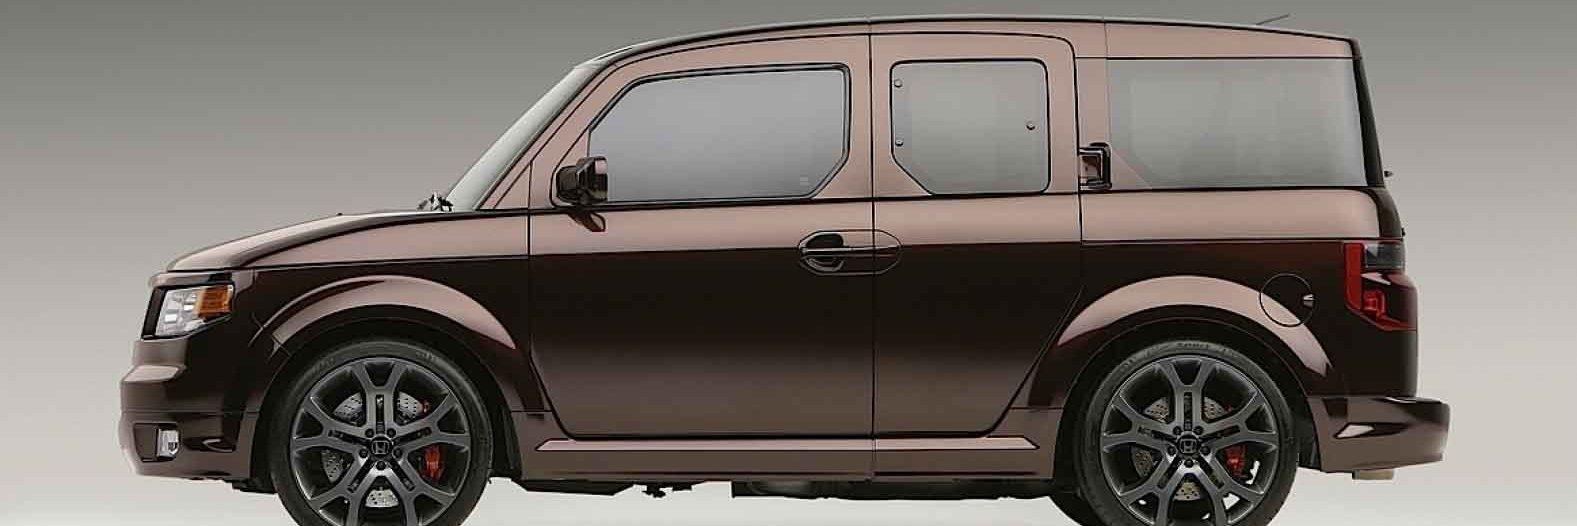 2019 Honda Element